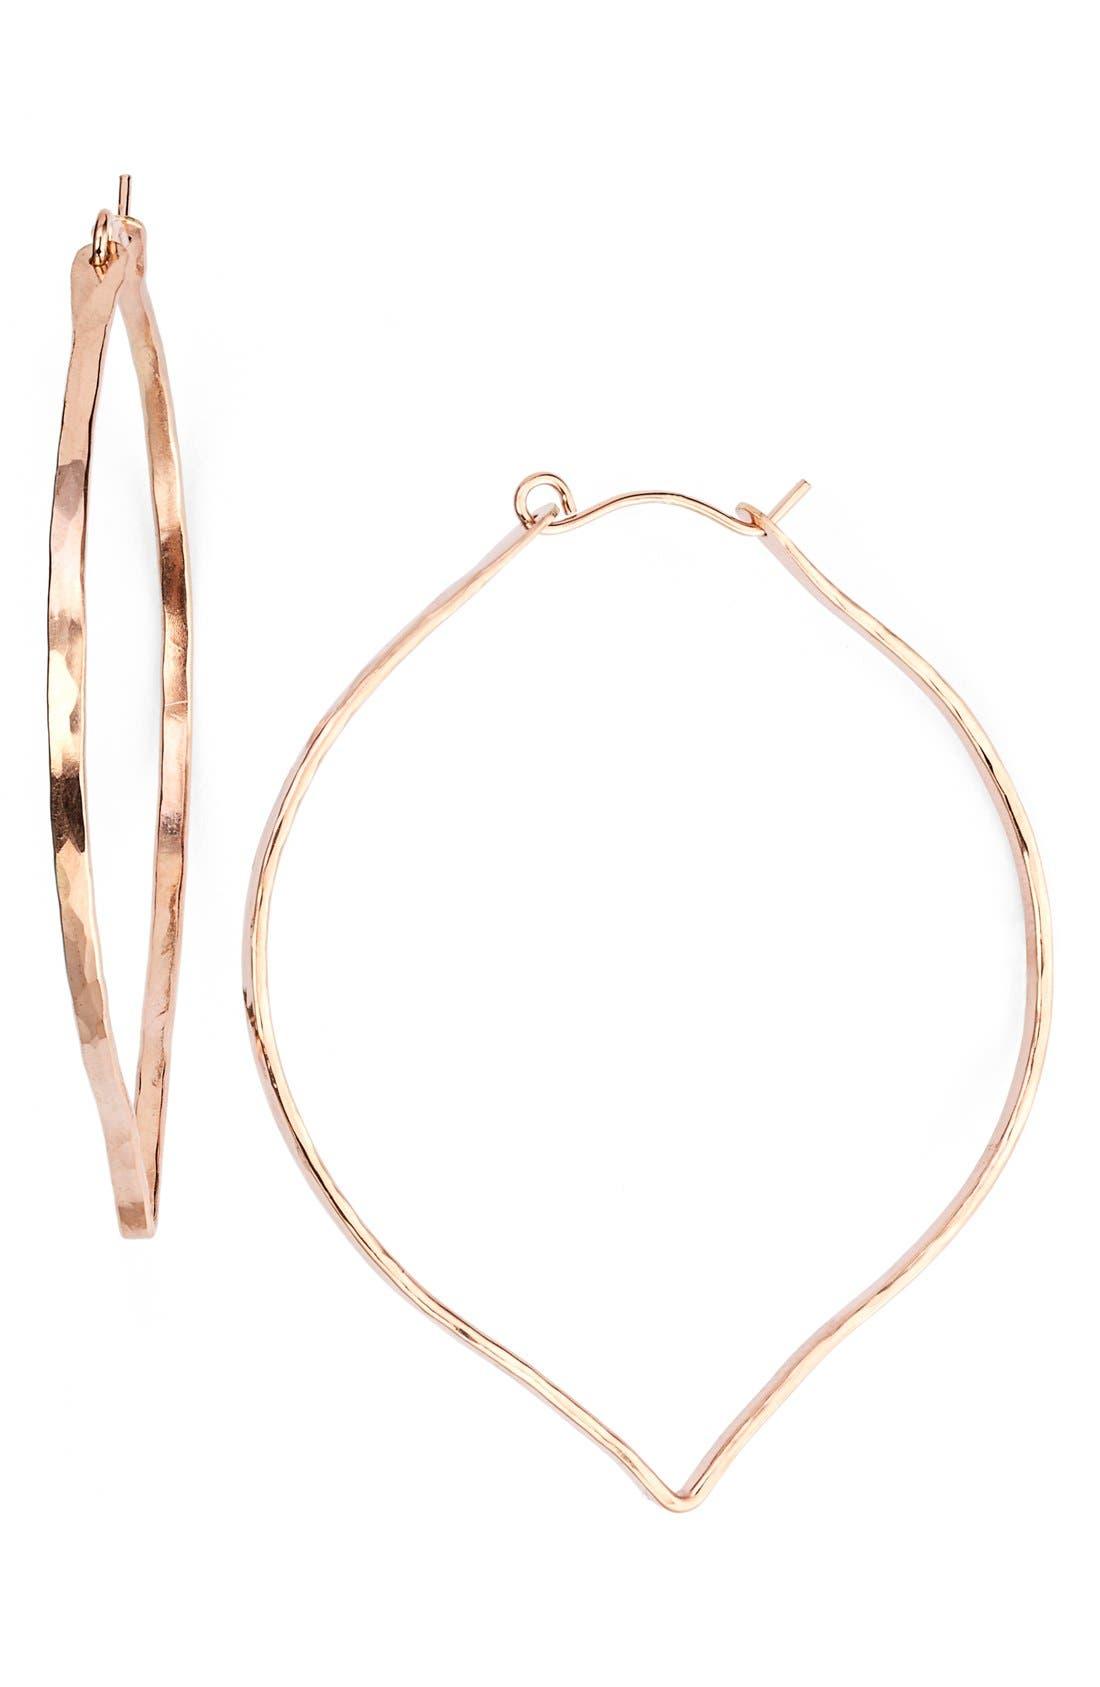 Main Image - Ija 'Large' 14k-Rose Gold Fill Lotus Hoop Earrings